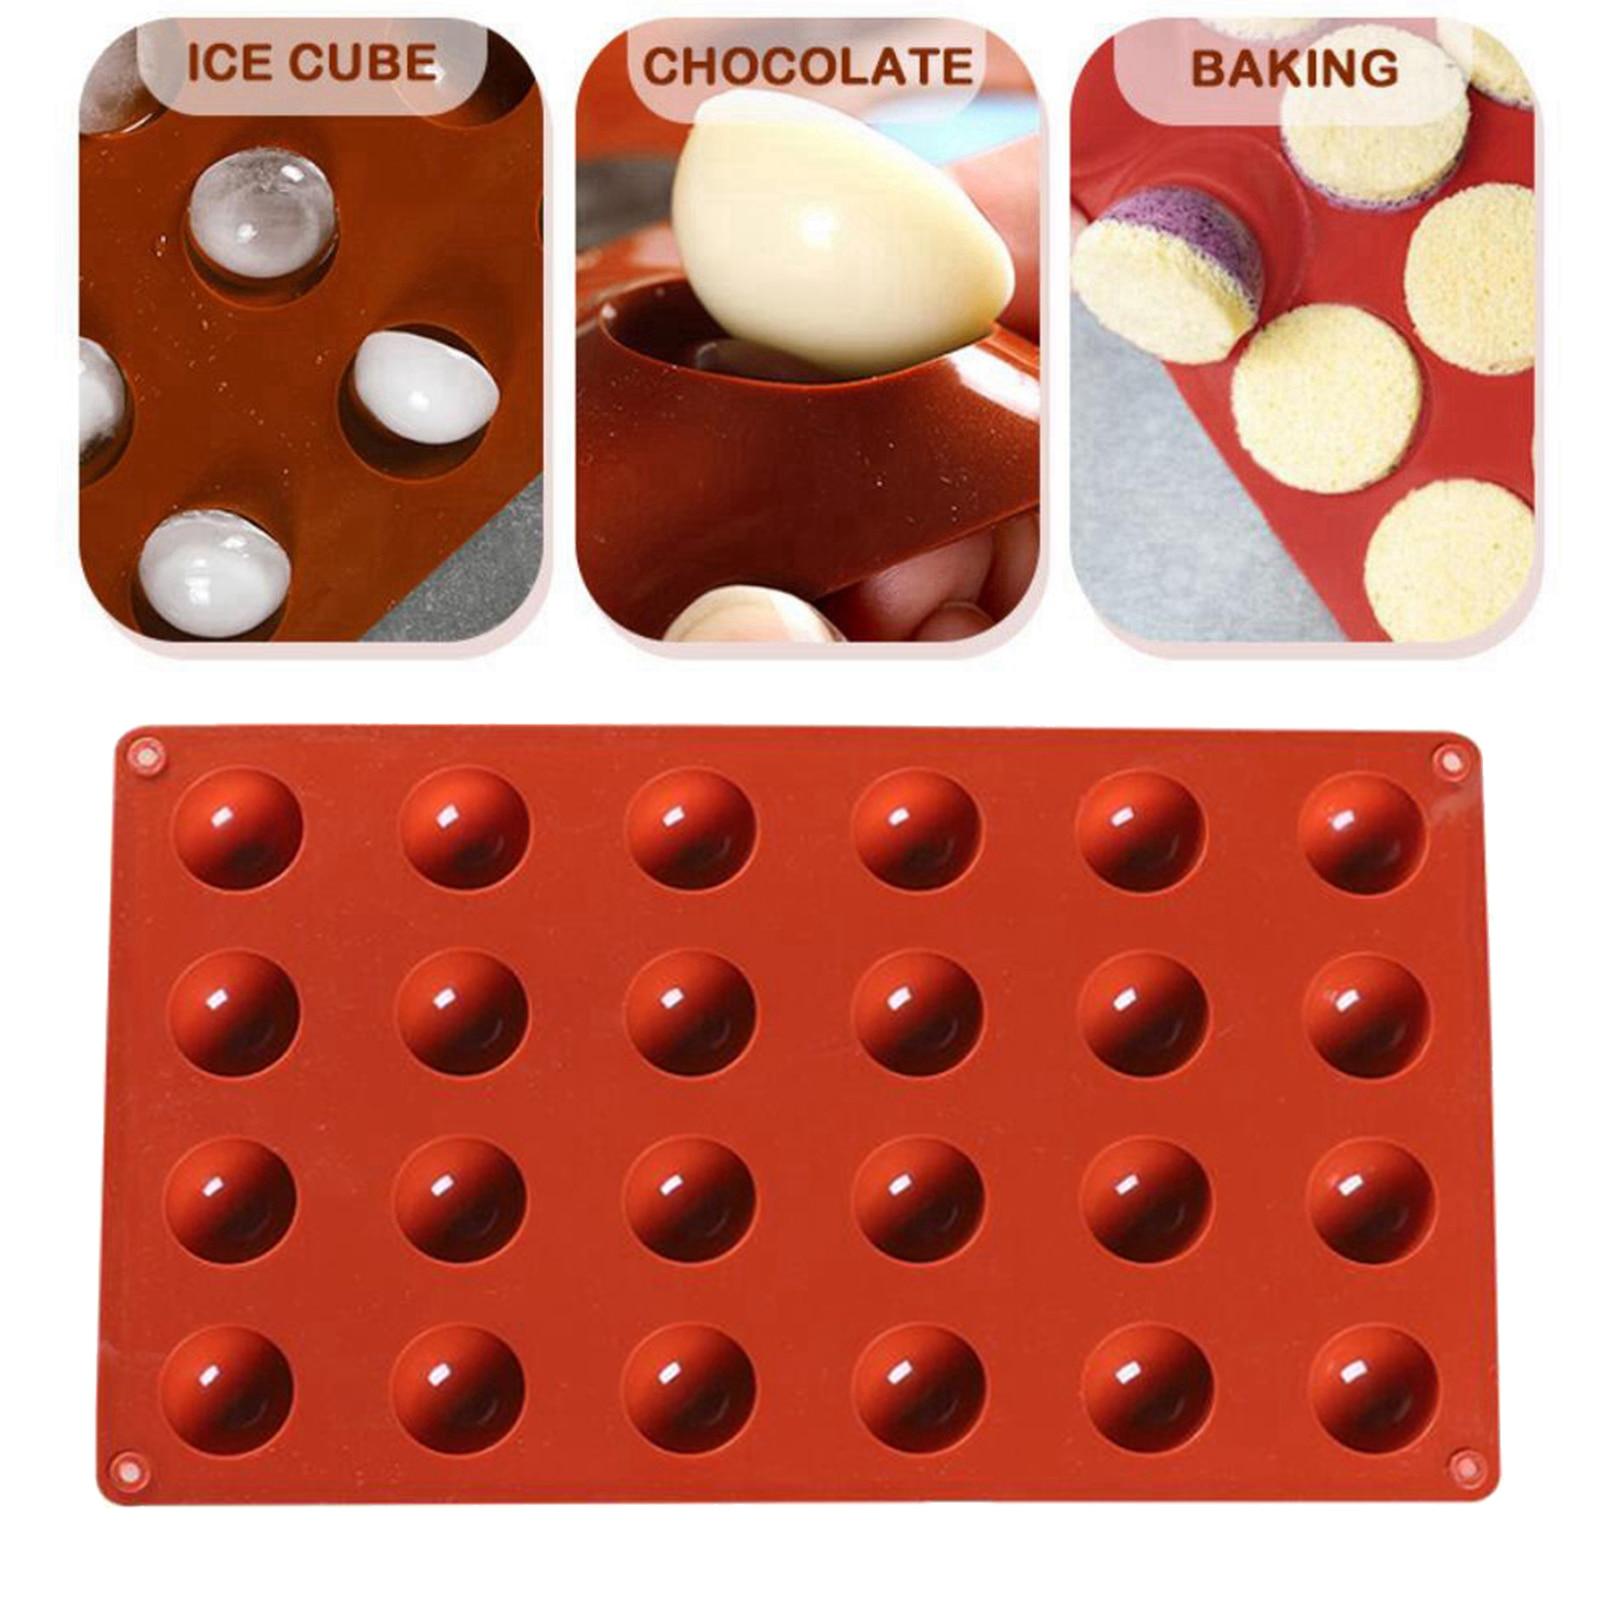 24 buraco retângulo molde de chocolate muffin ferramenta de cozinha bolo cookhalf esfera silicone bolo molde bolinho biscoito cozimento pan